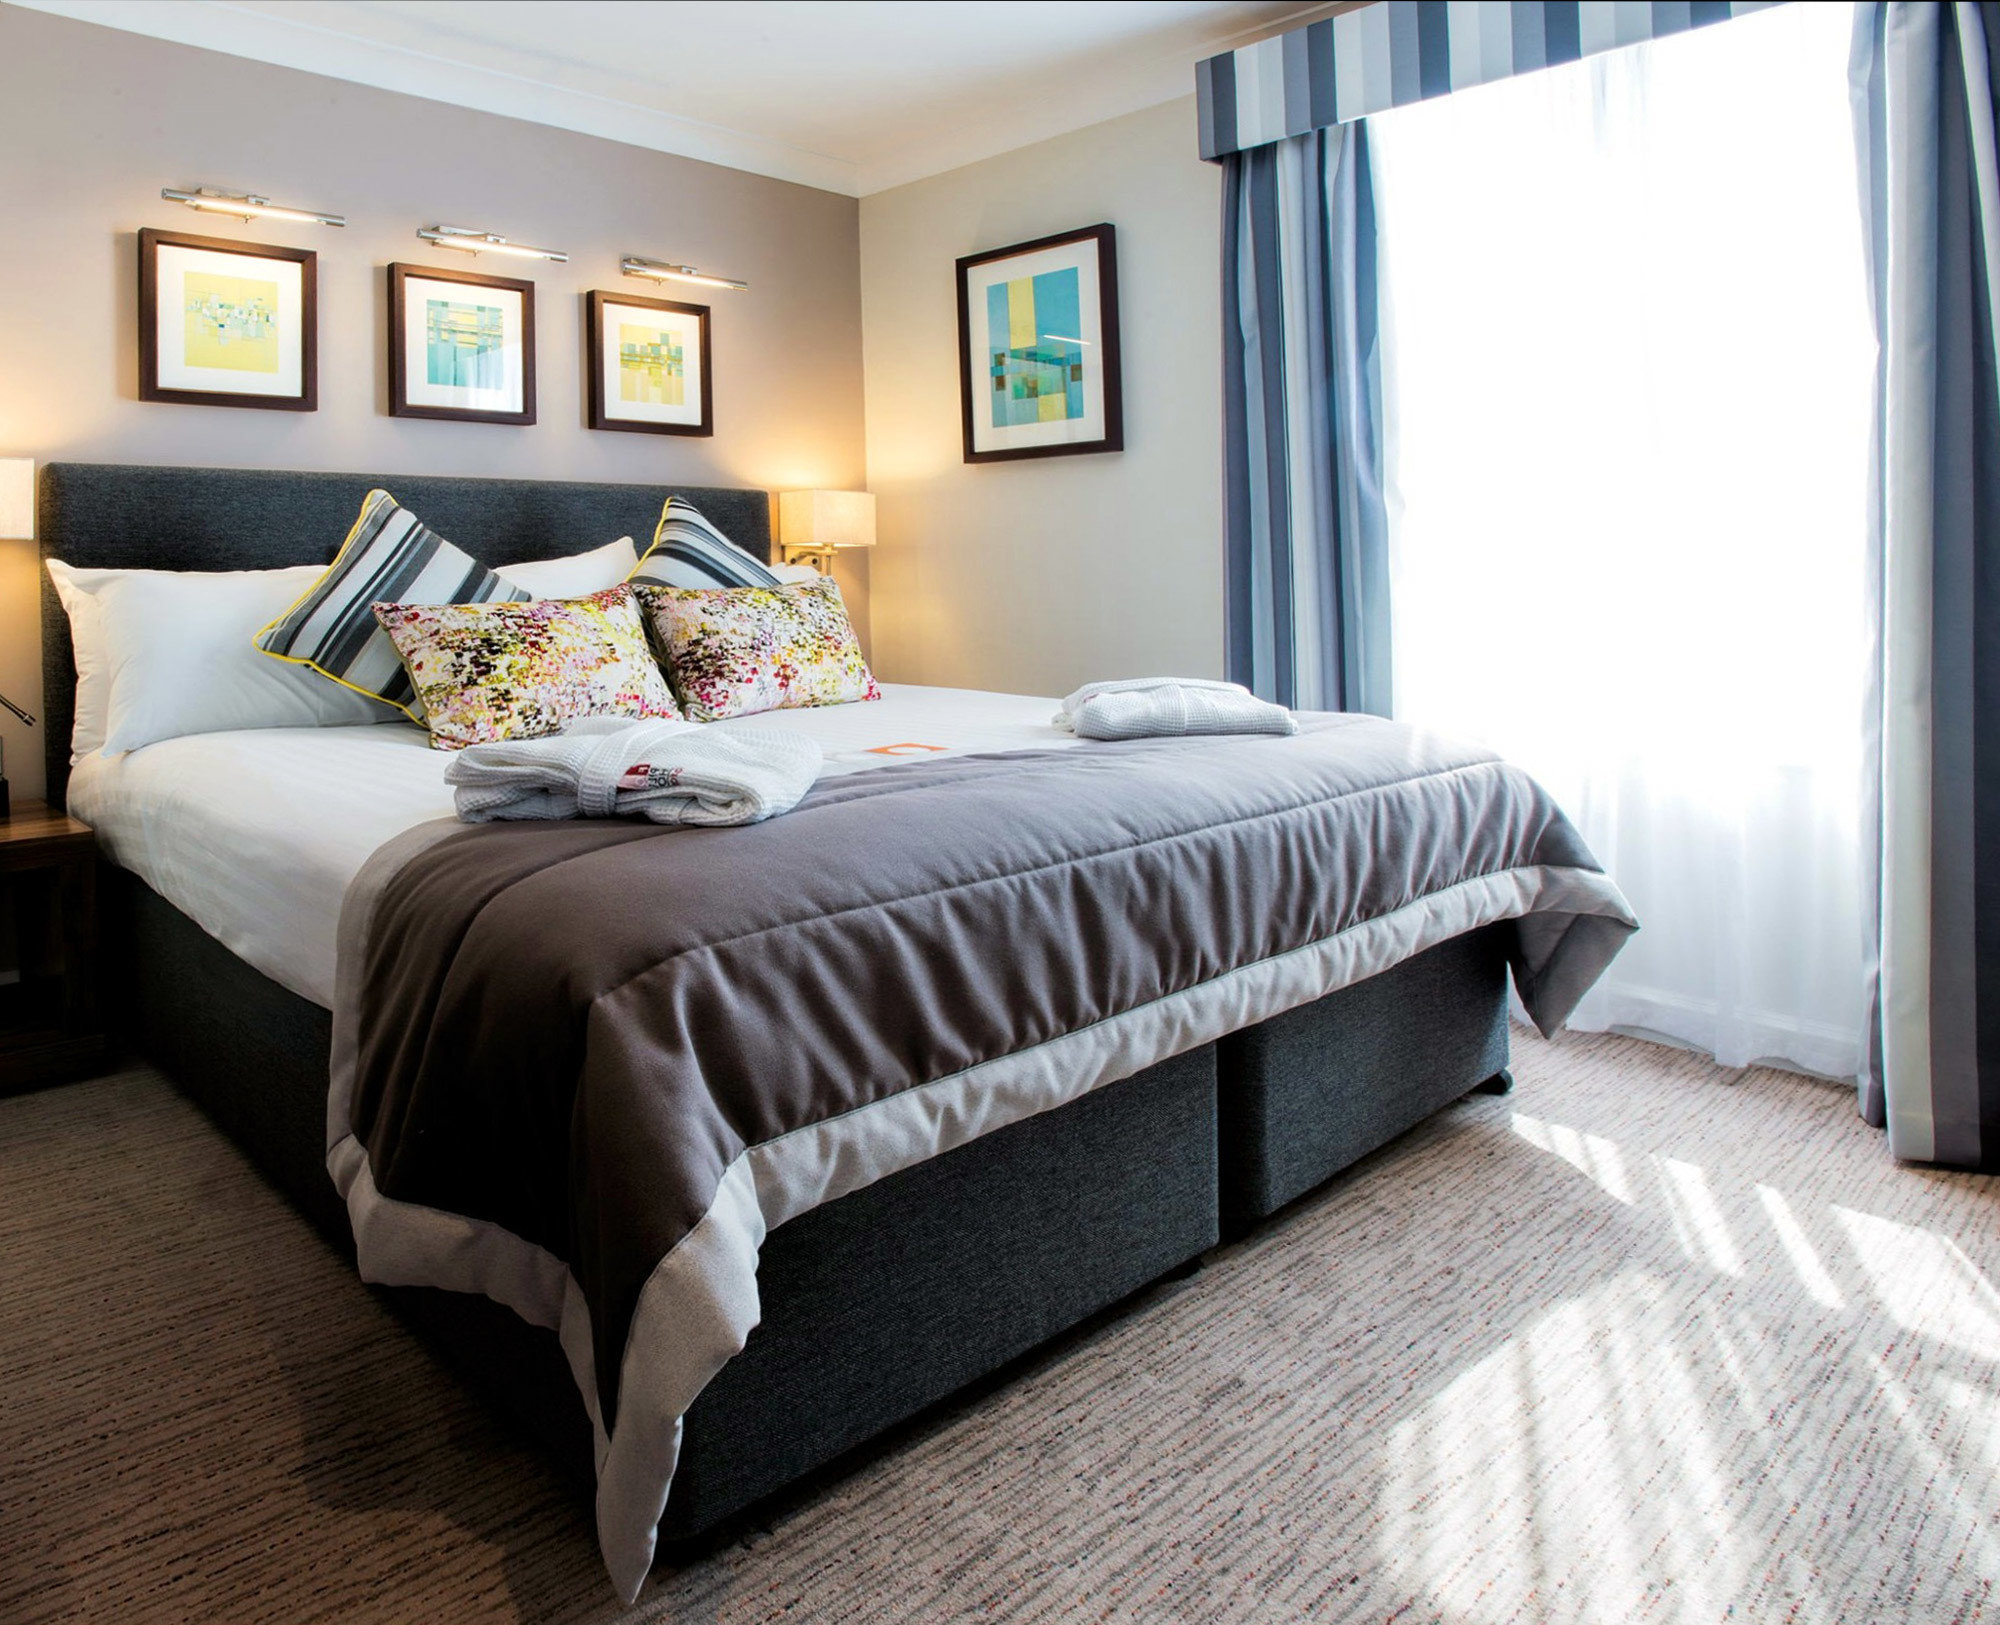 Bedroom property bed frame cottage bed sheet studio couch living room